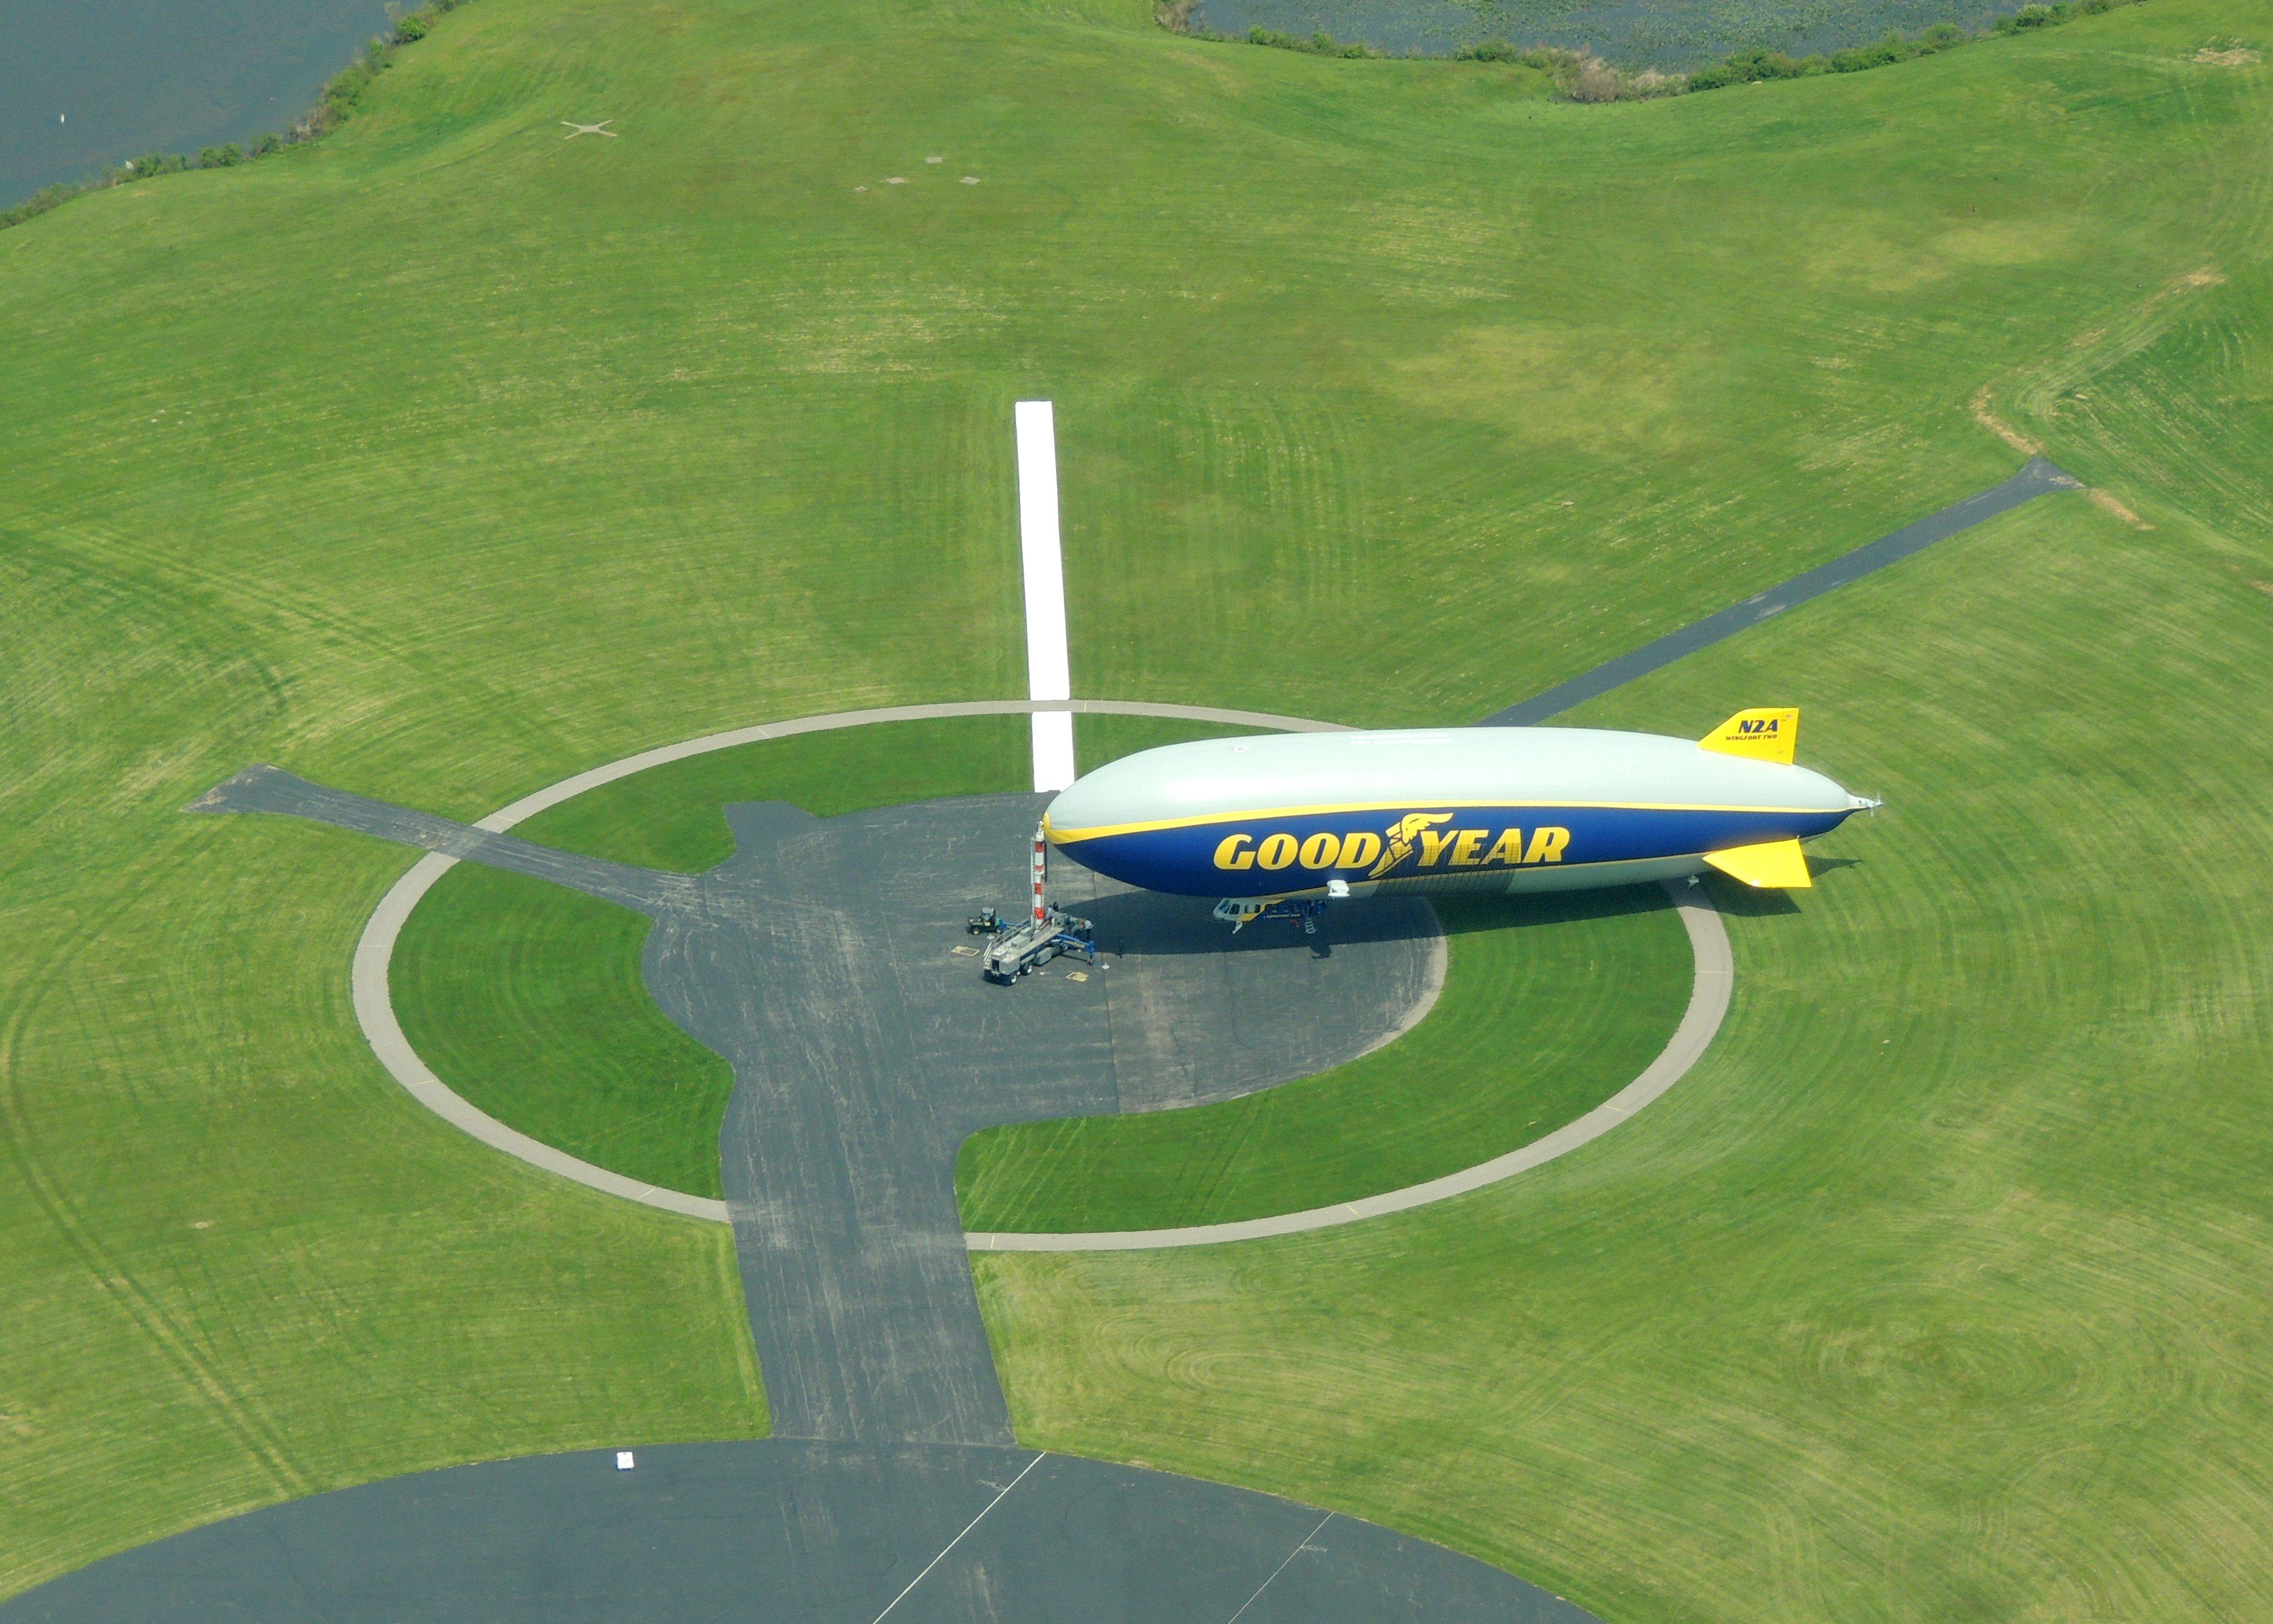 Goodyear Blimp  (Wingfoot Lake Airship Operations.... Ohio)